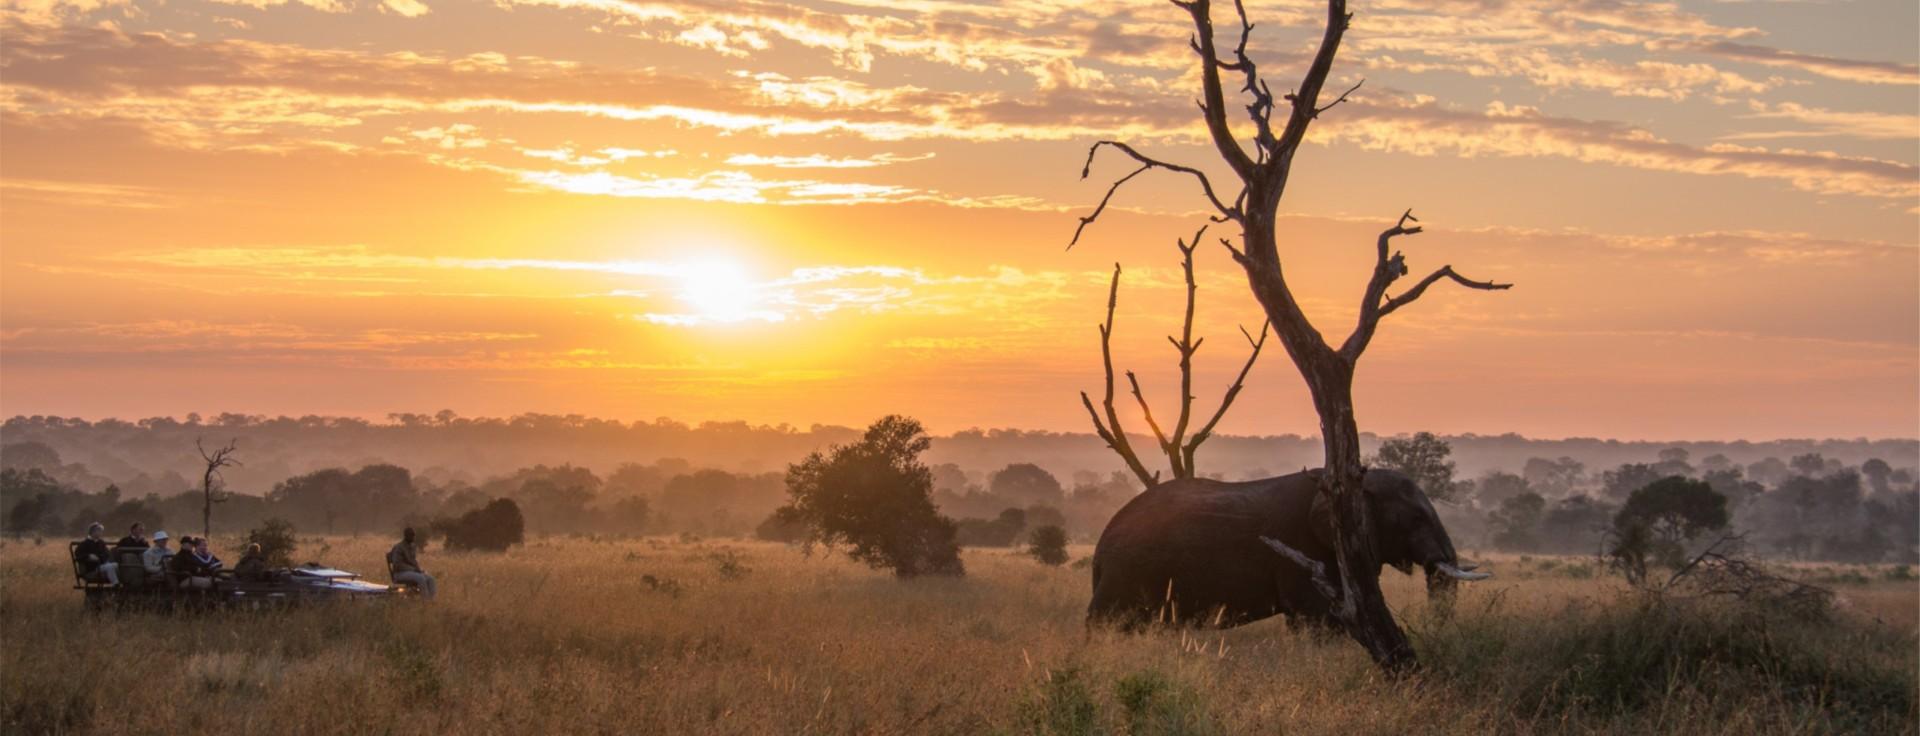 Elephants by Sunset.jpg